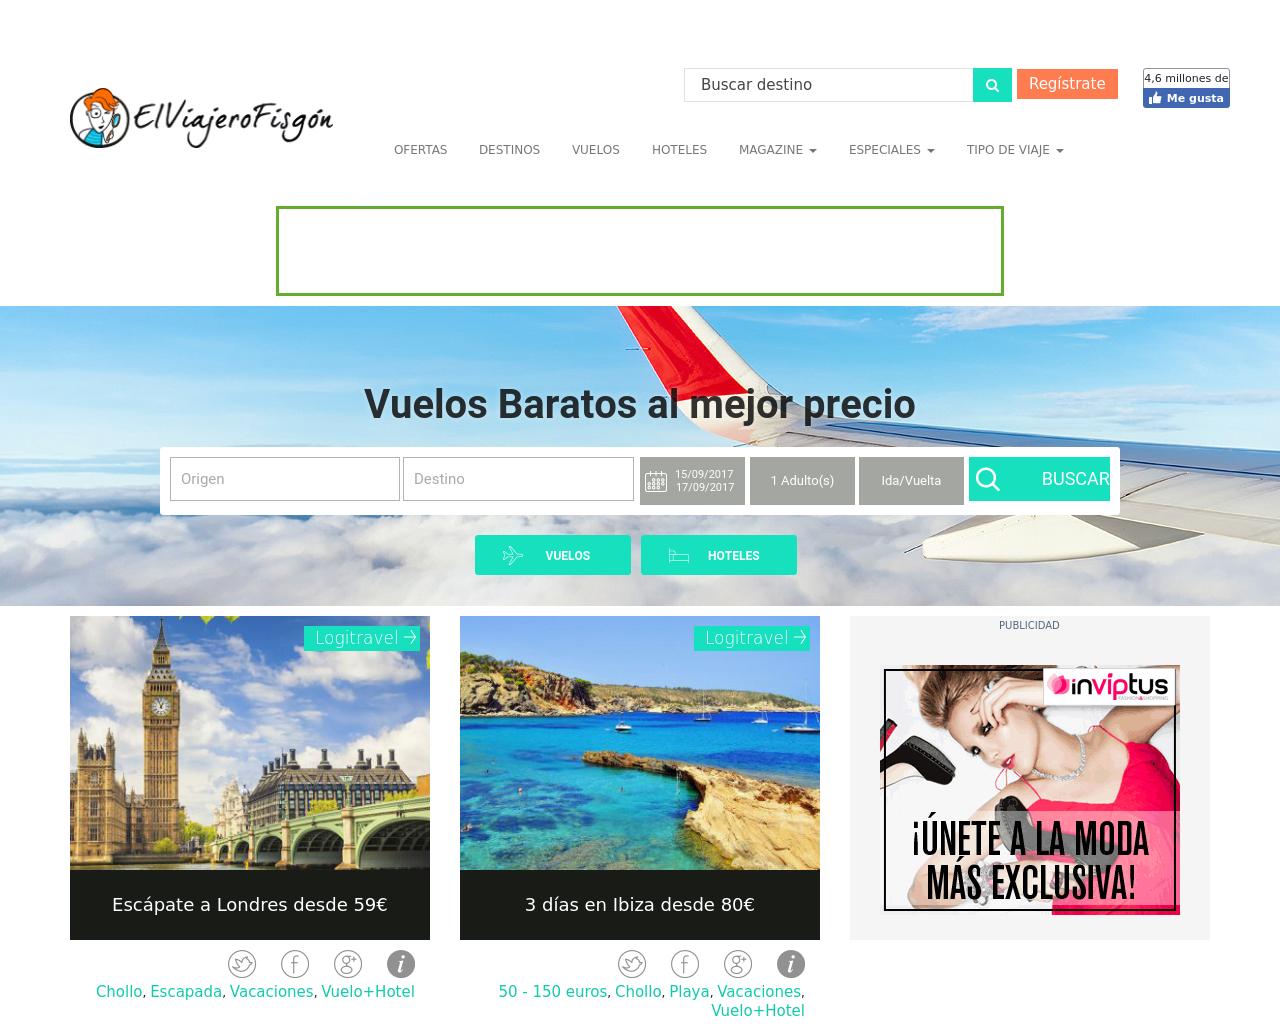 El-Viajero-Fisgon-(Sniff-The-Traveler)-Advertising-Reviews-Pricing